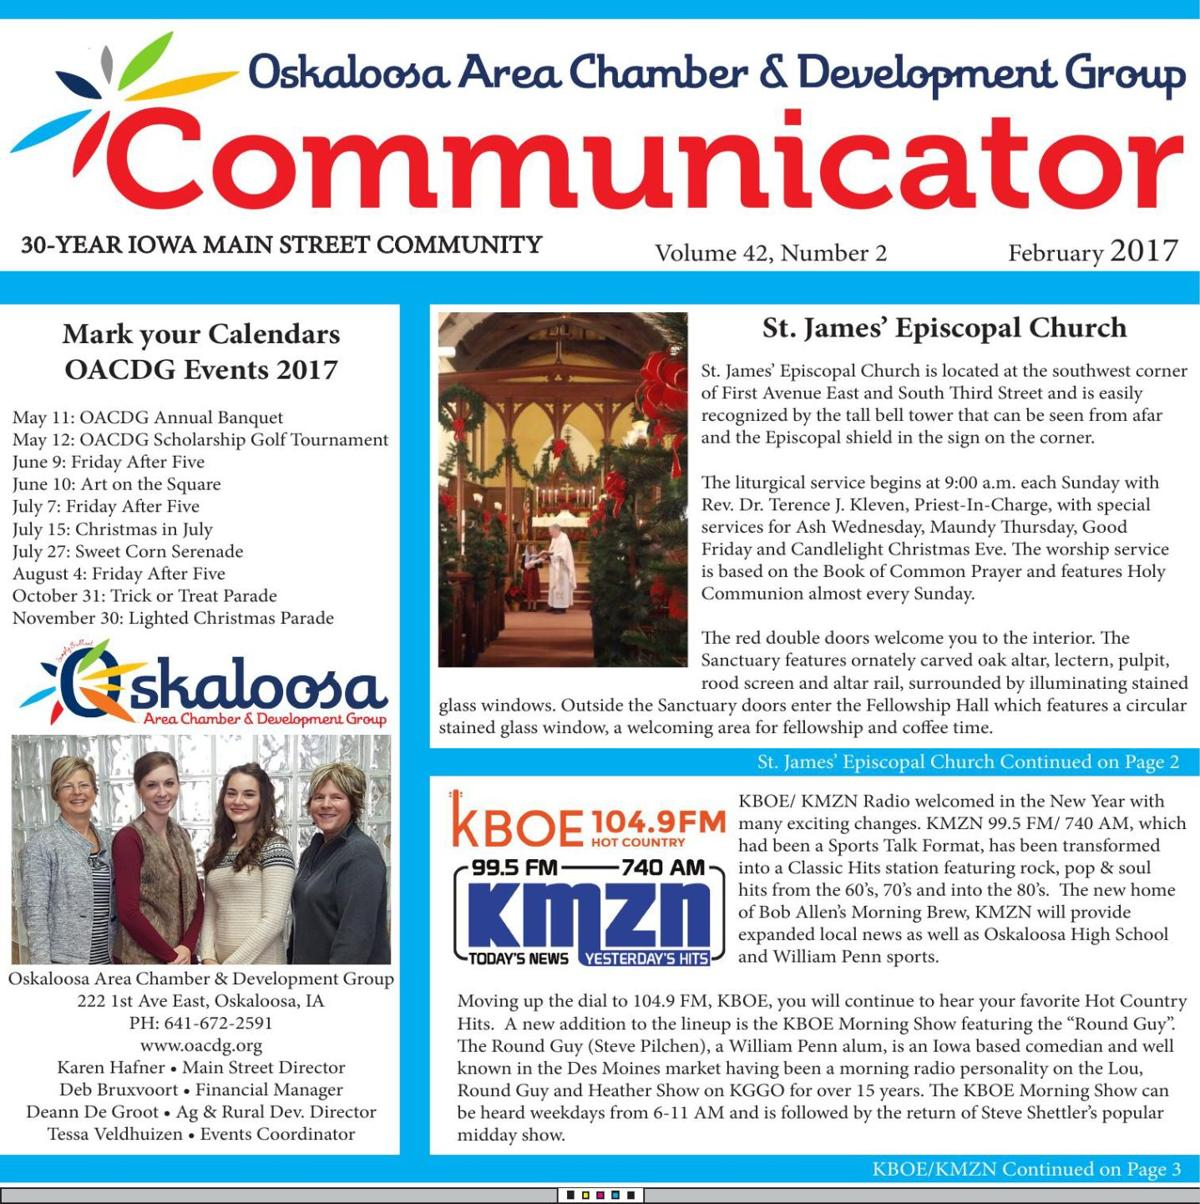 February 2017 Chamber Communicator